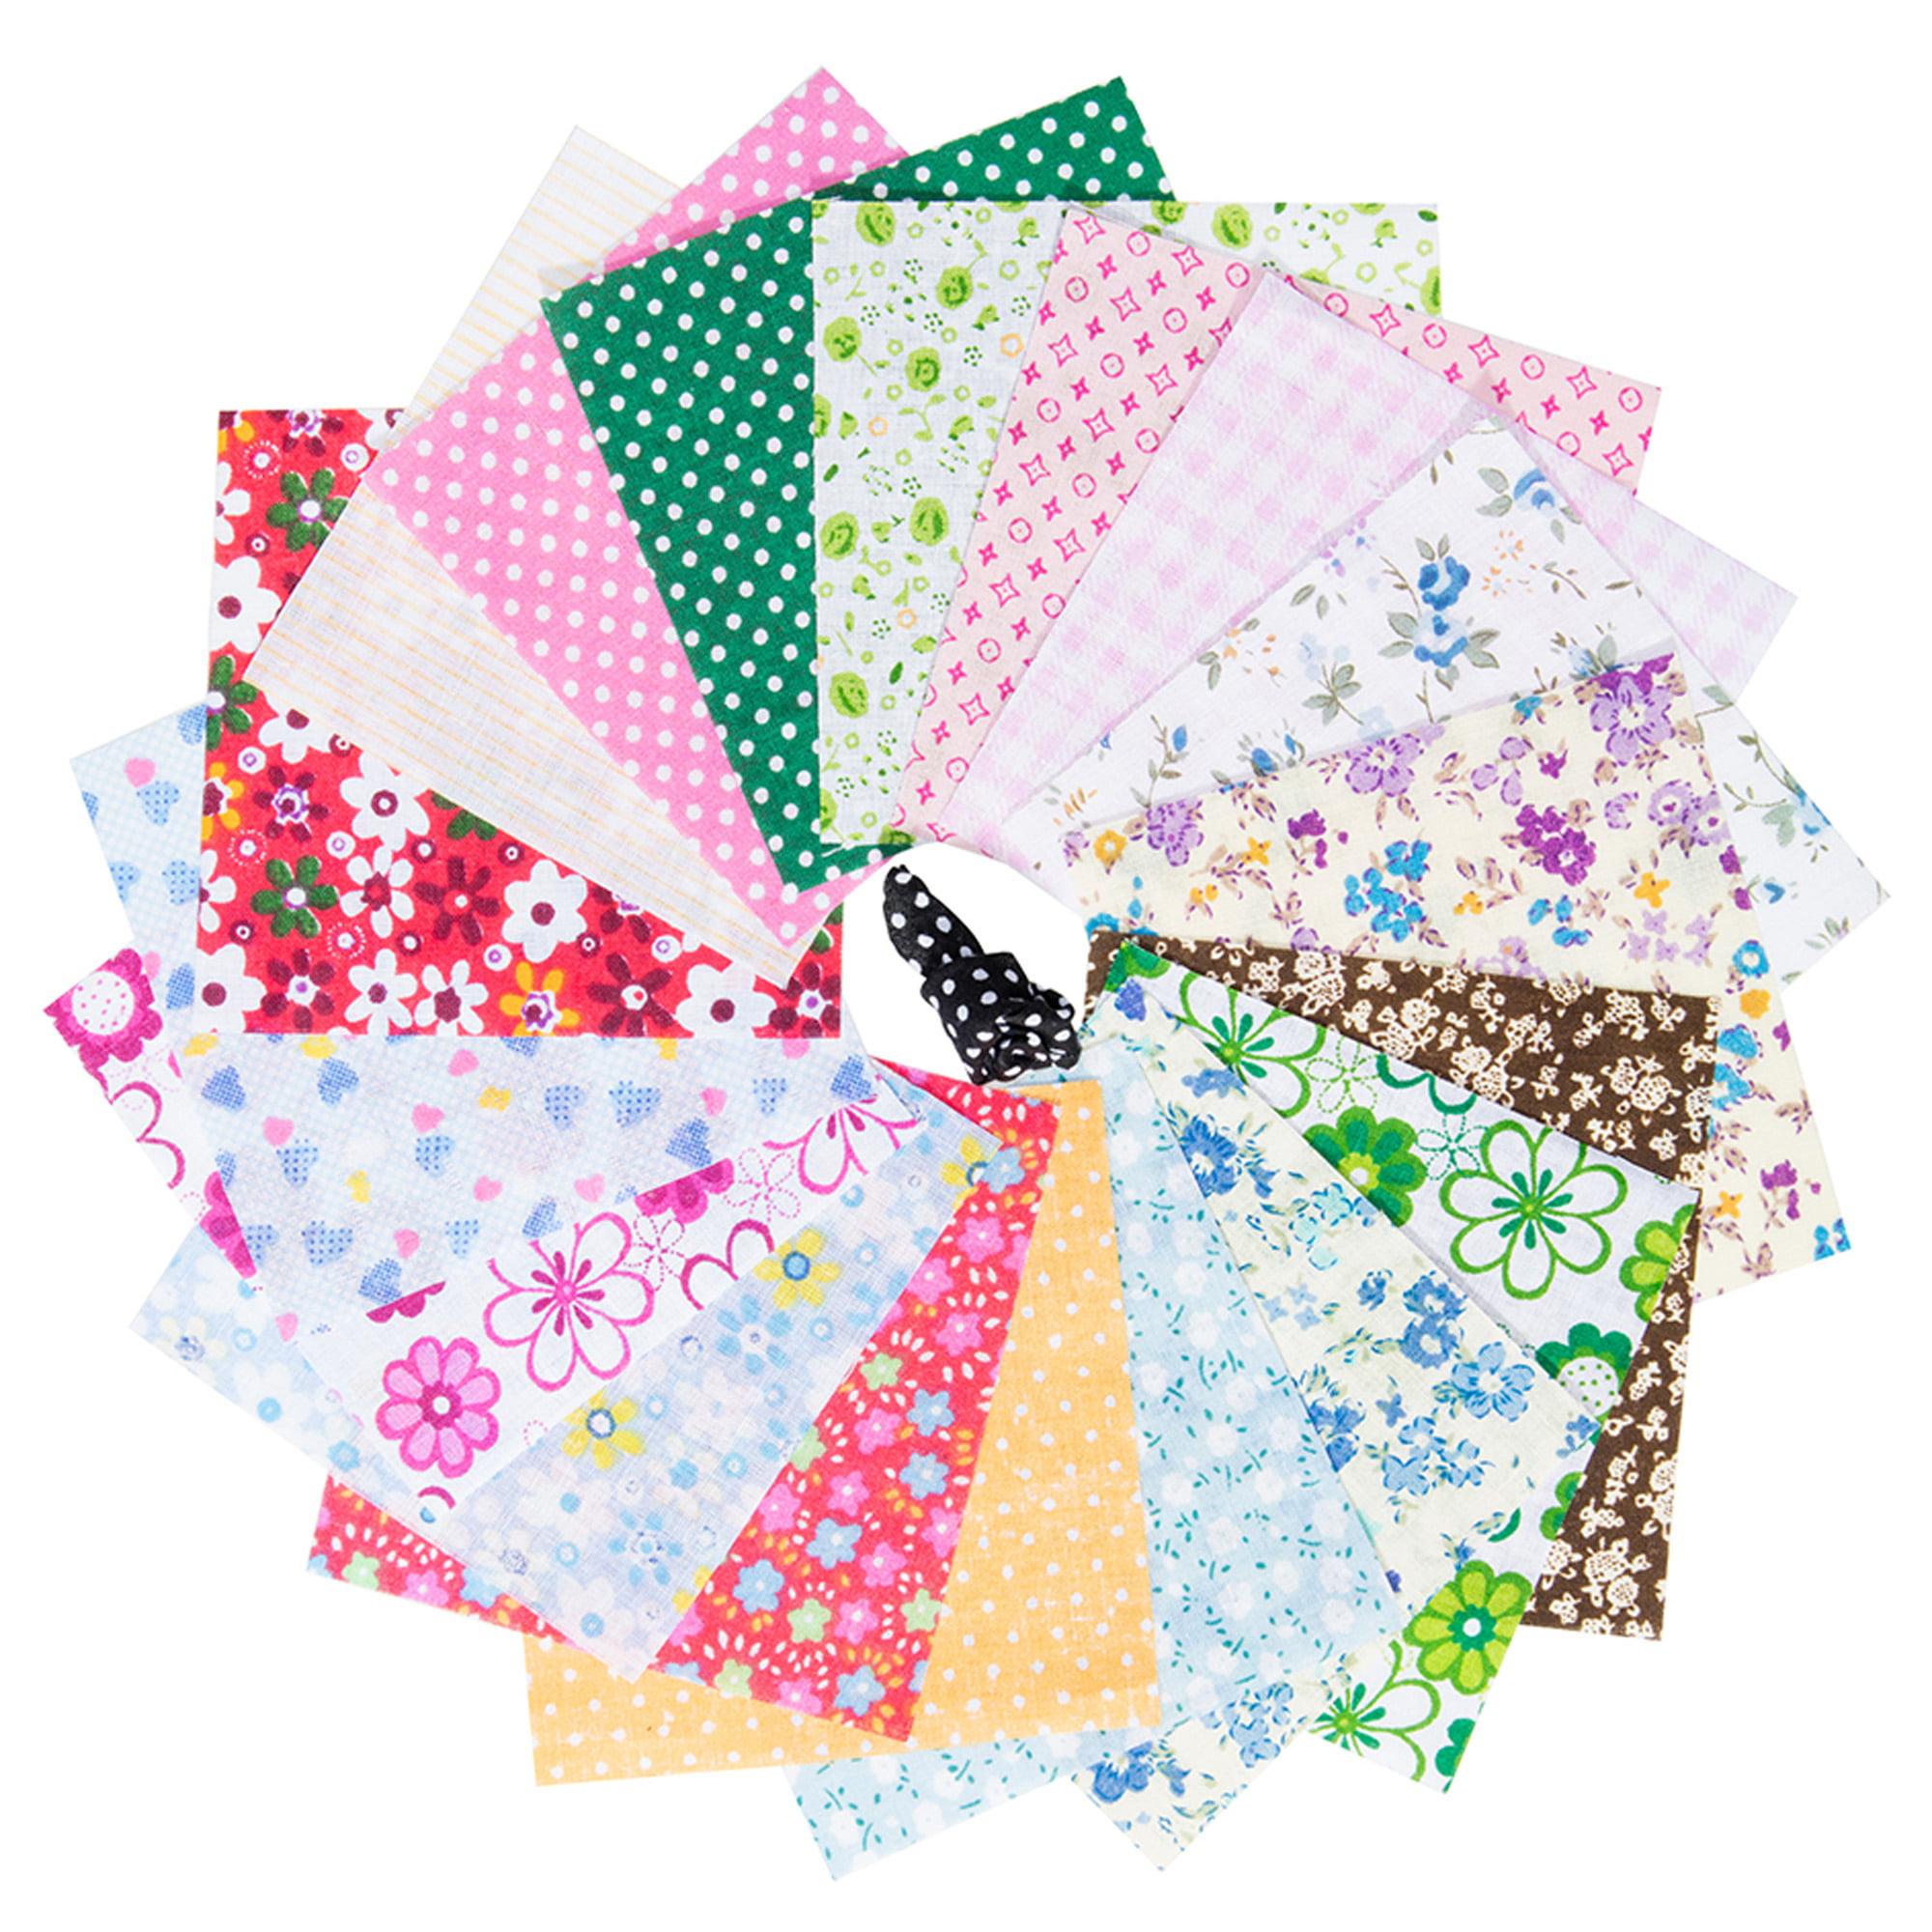 10 x 10 cm 50 Colors 50 Pieces Multi-Colors Fabric Patchwork Cotton Mixed Squares Bundle Sewing Quilting Craft